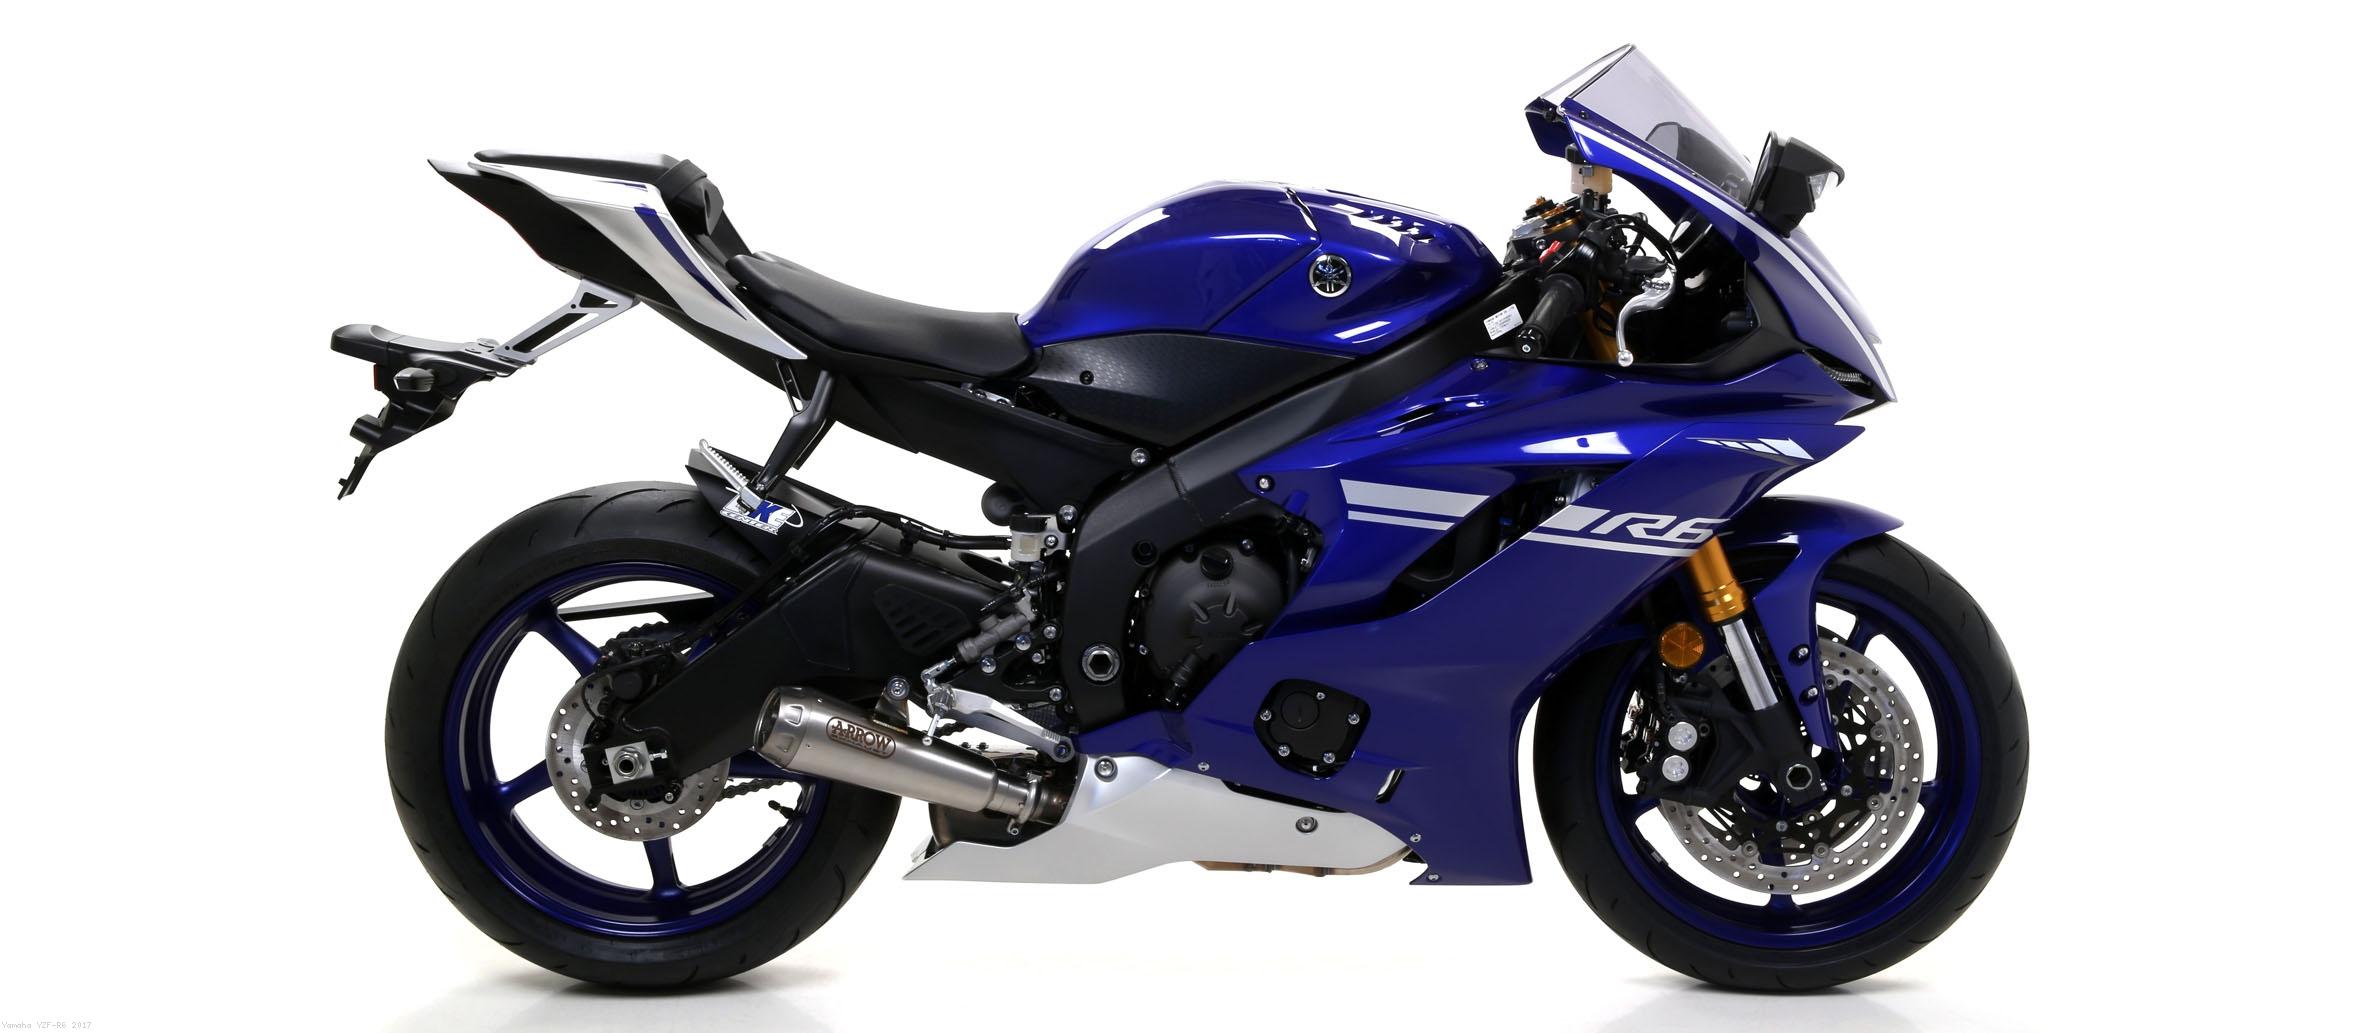 Pro Race Nichrom Slip On Exhaust By Arrow Yamaha YZF R6